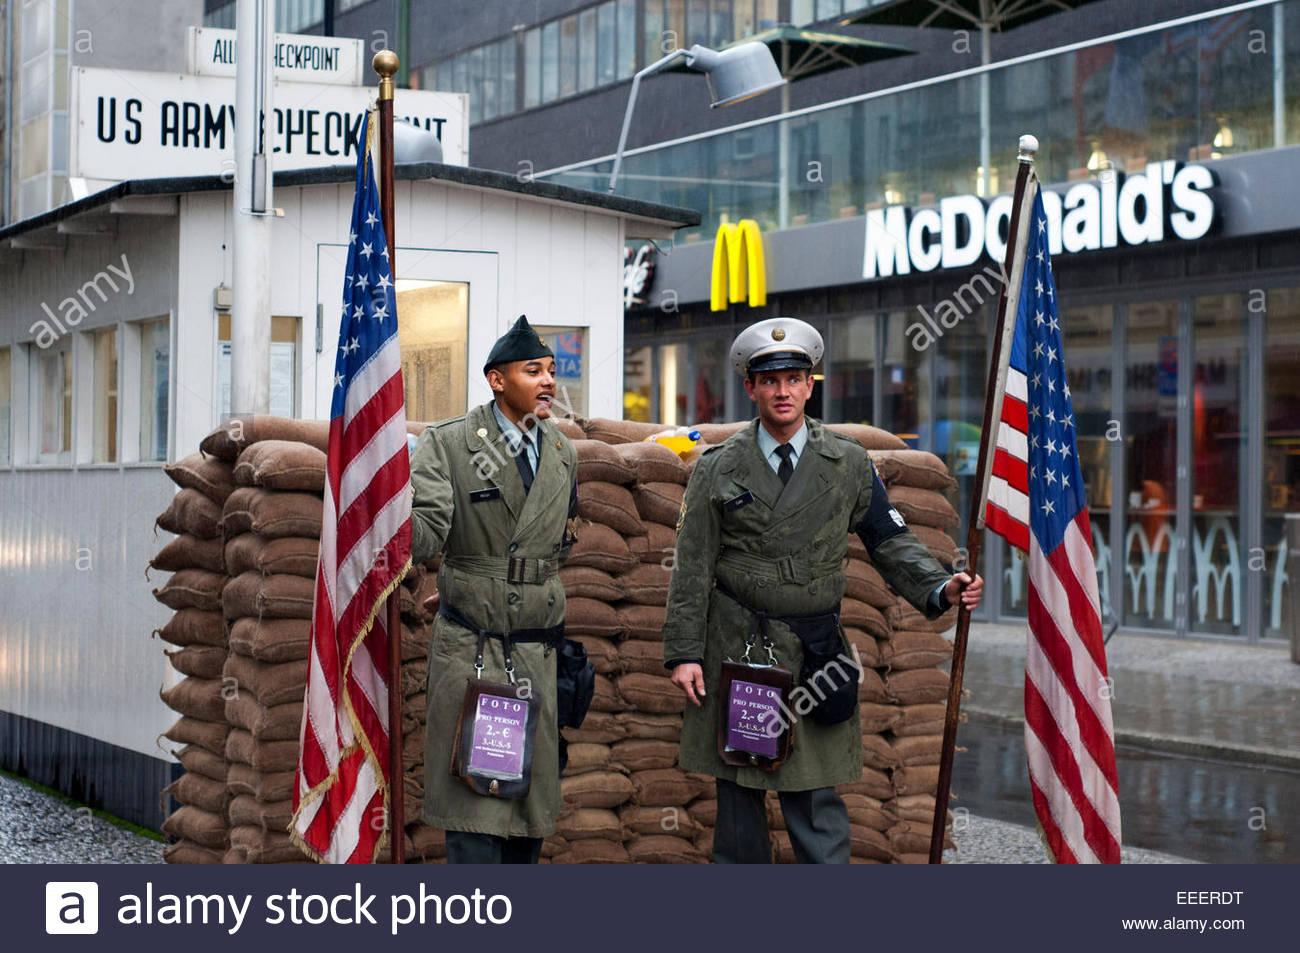 Guerra fría Checkpoint Charlie Berlin Friedrichstrasse famoso cruce fronterizo americano sectores soviético Imagen De Stock